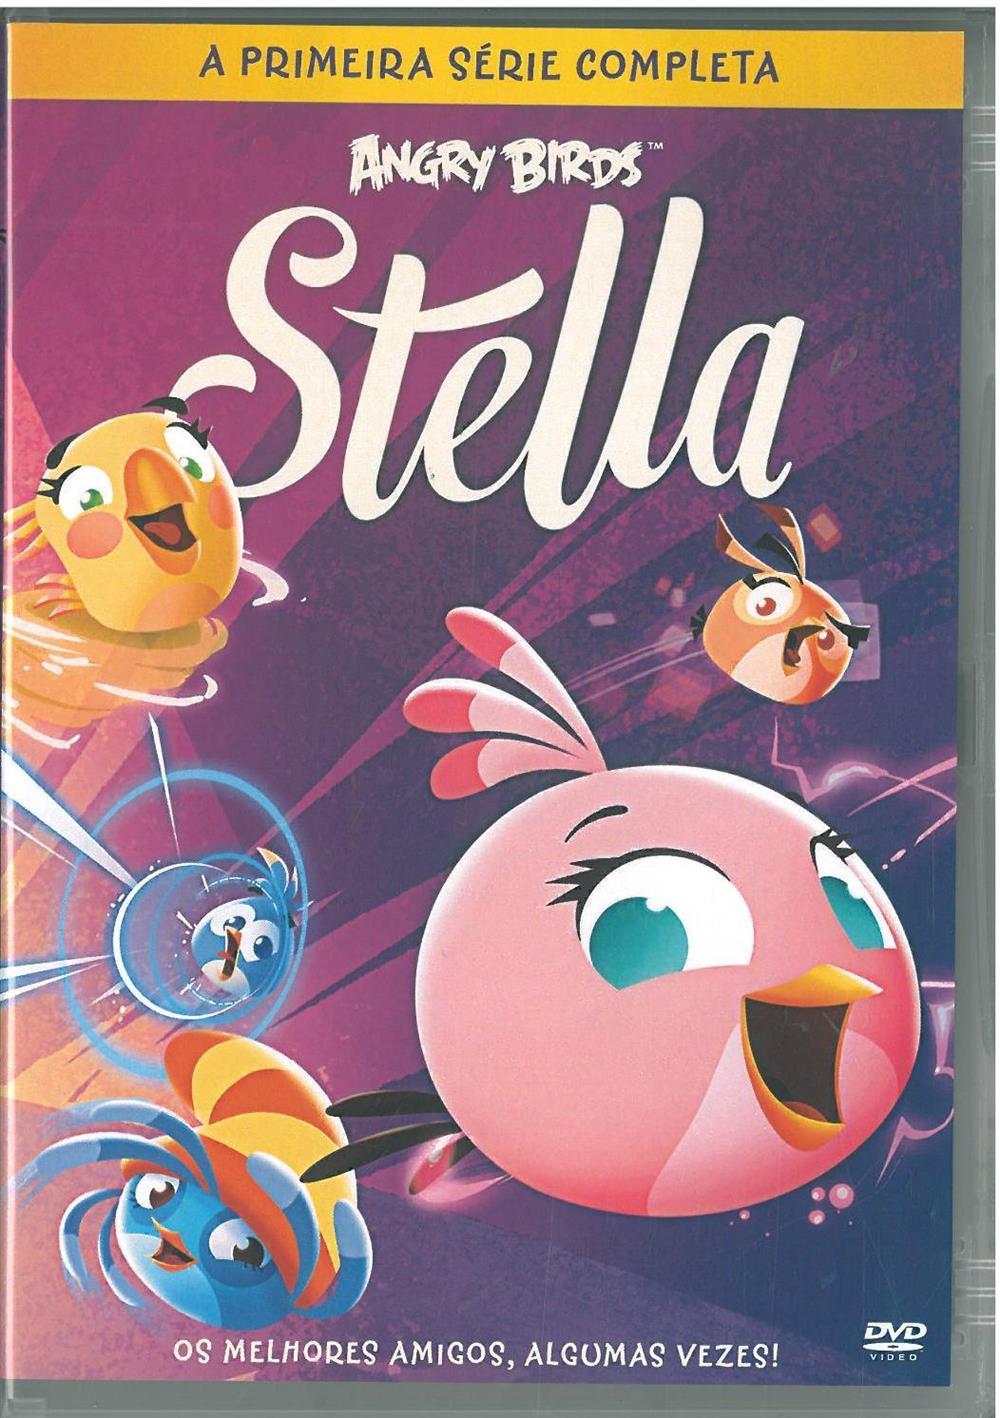 Angry birds_Stella_DVD.jpg